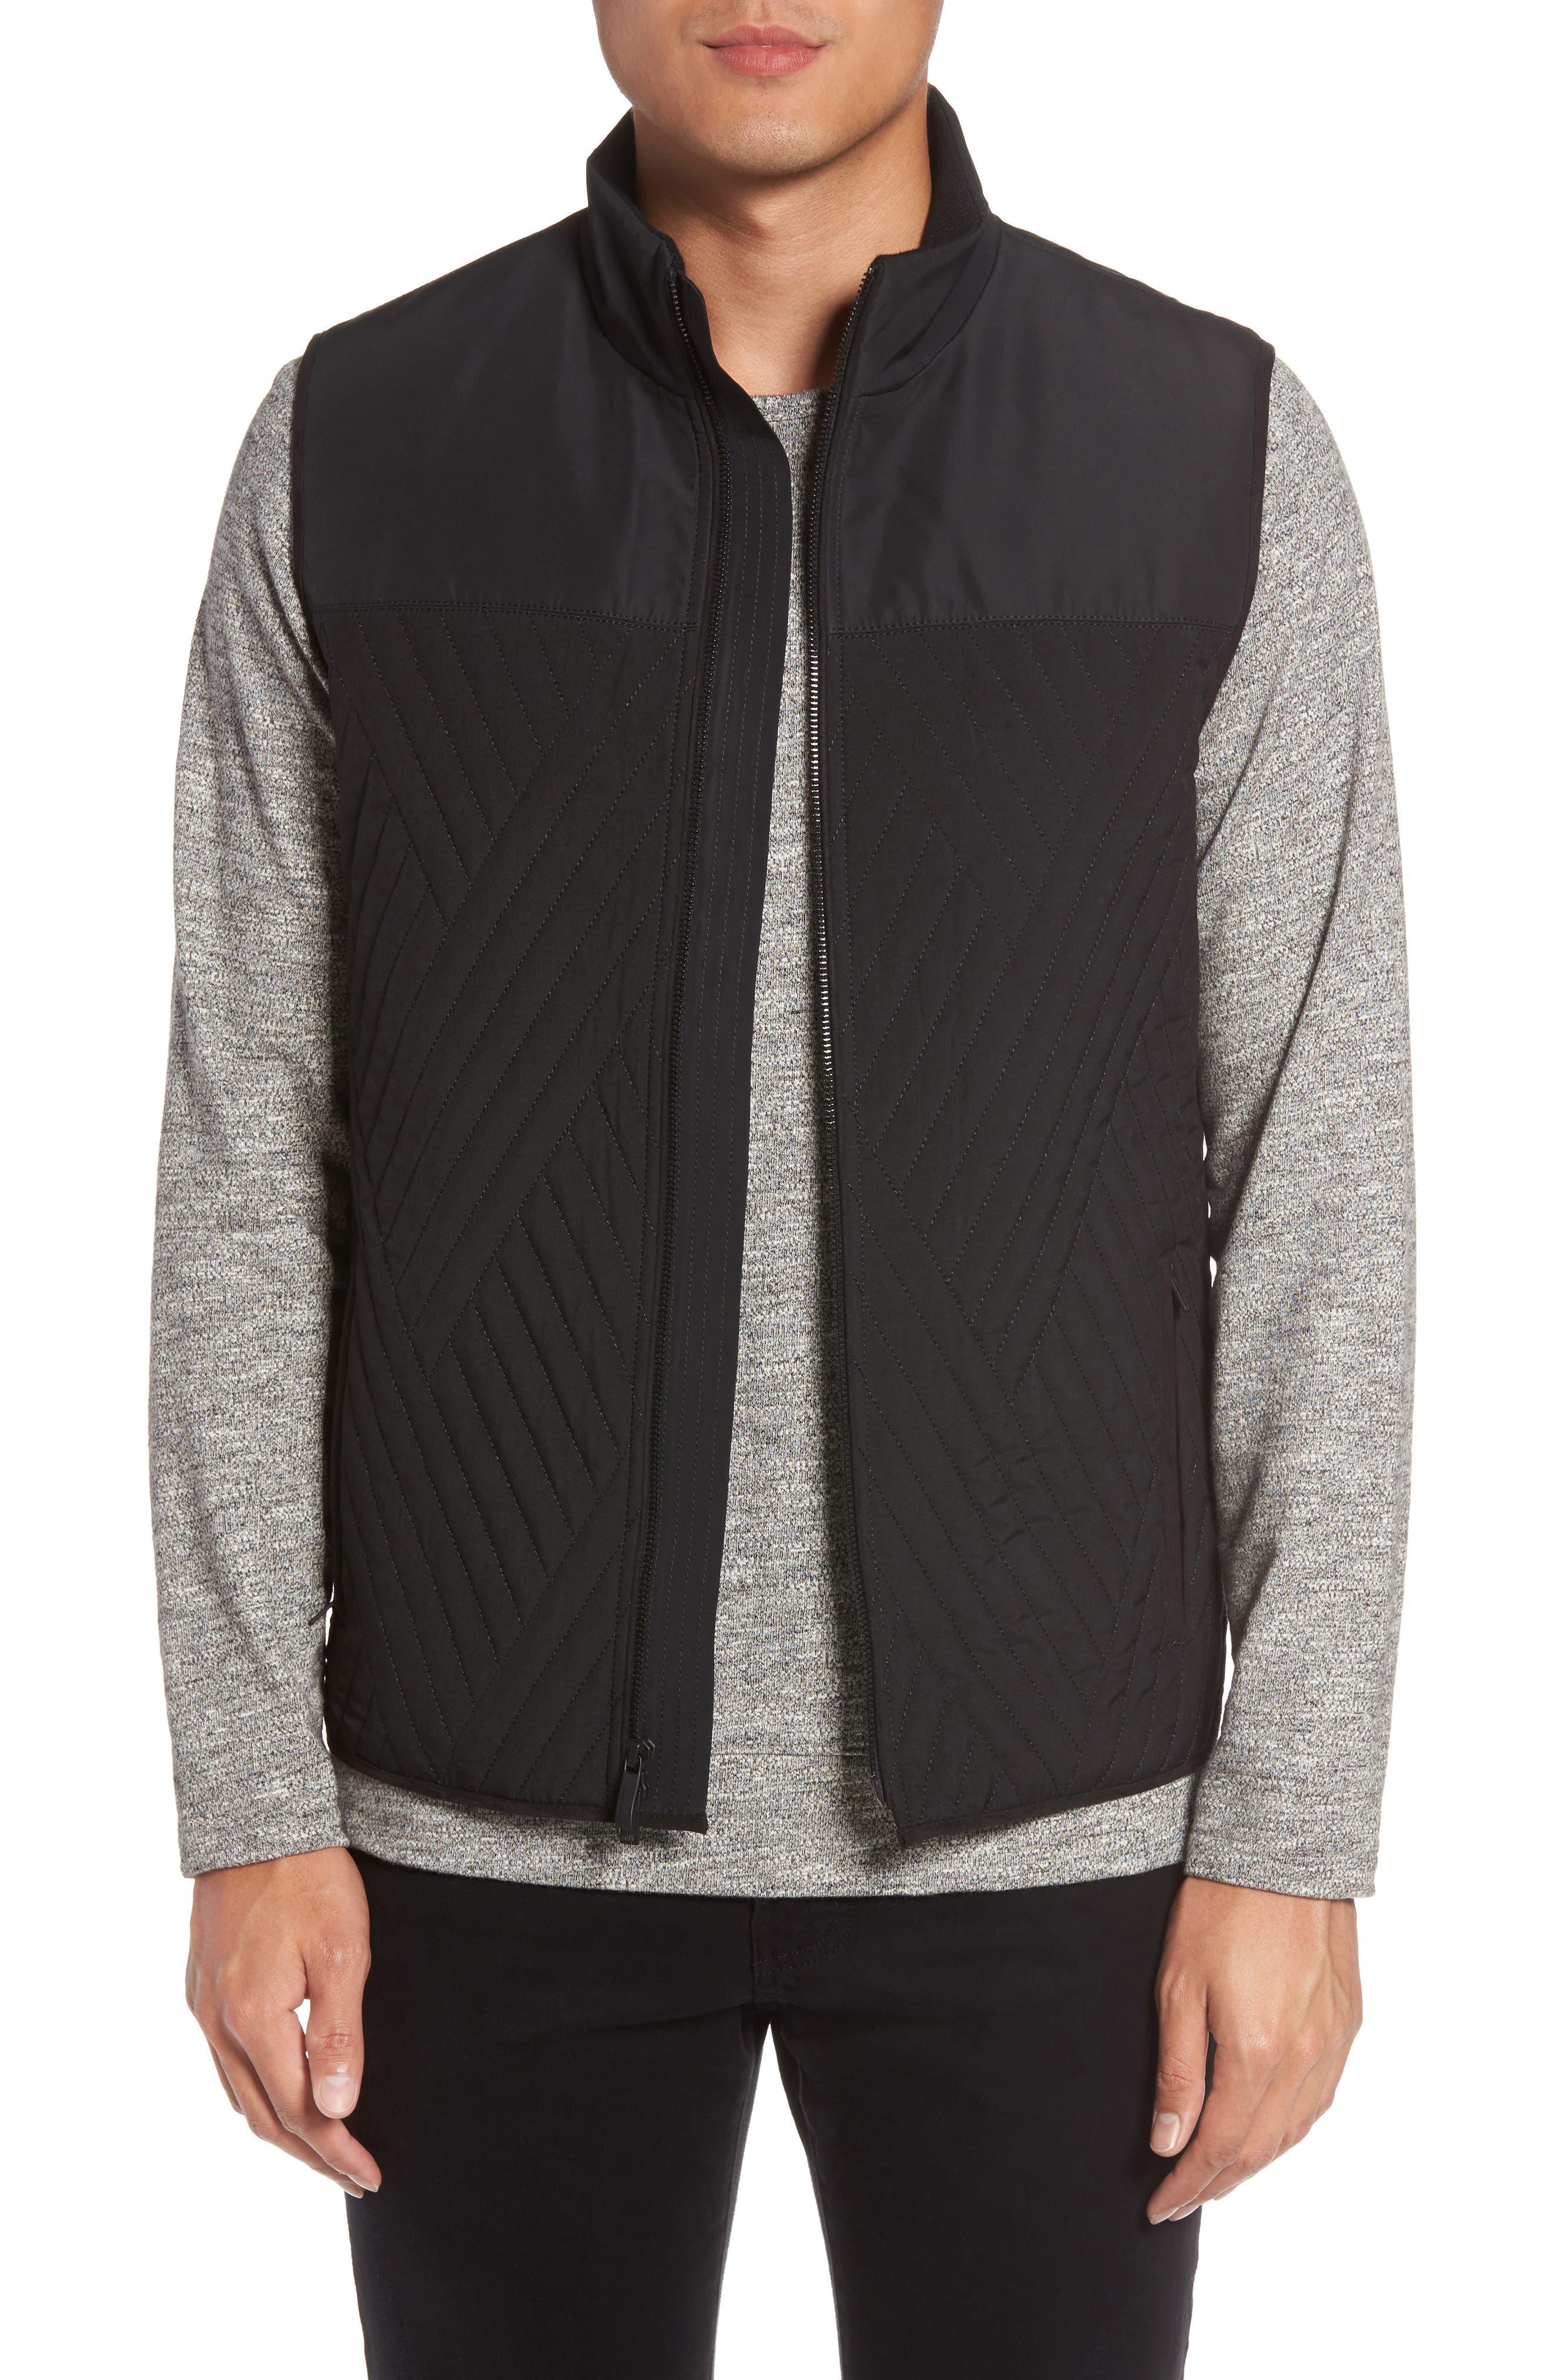 VINCE CAMUTO,                             Slim Fit Quilted Vest,                             Main thumbnail 1, color,                             BLACK